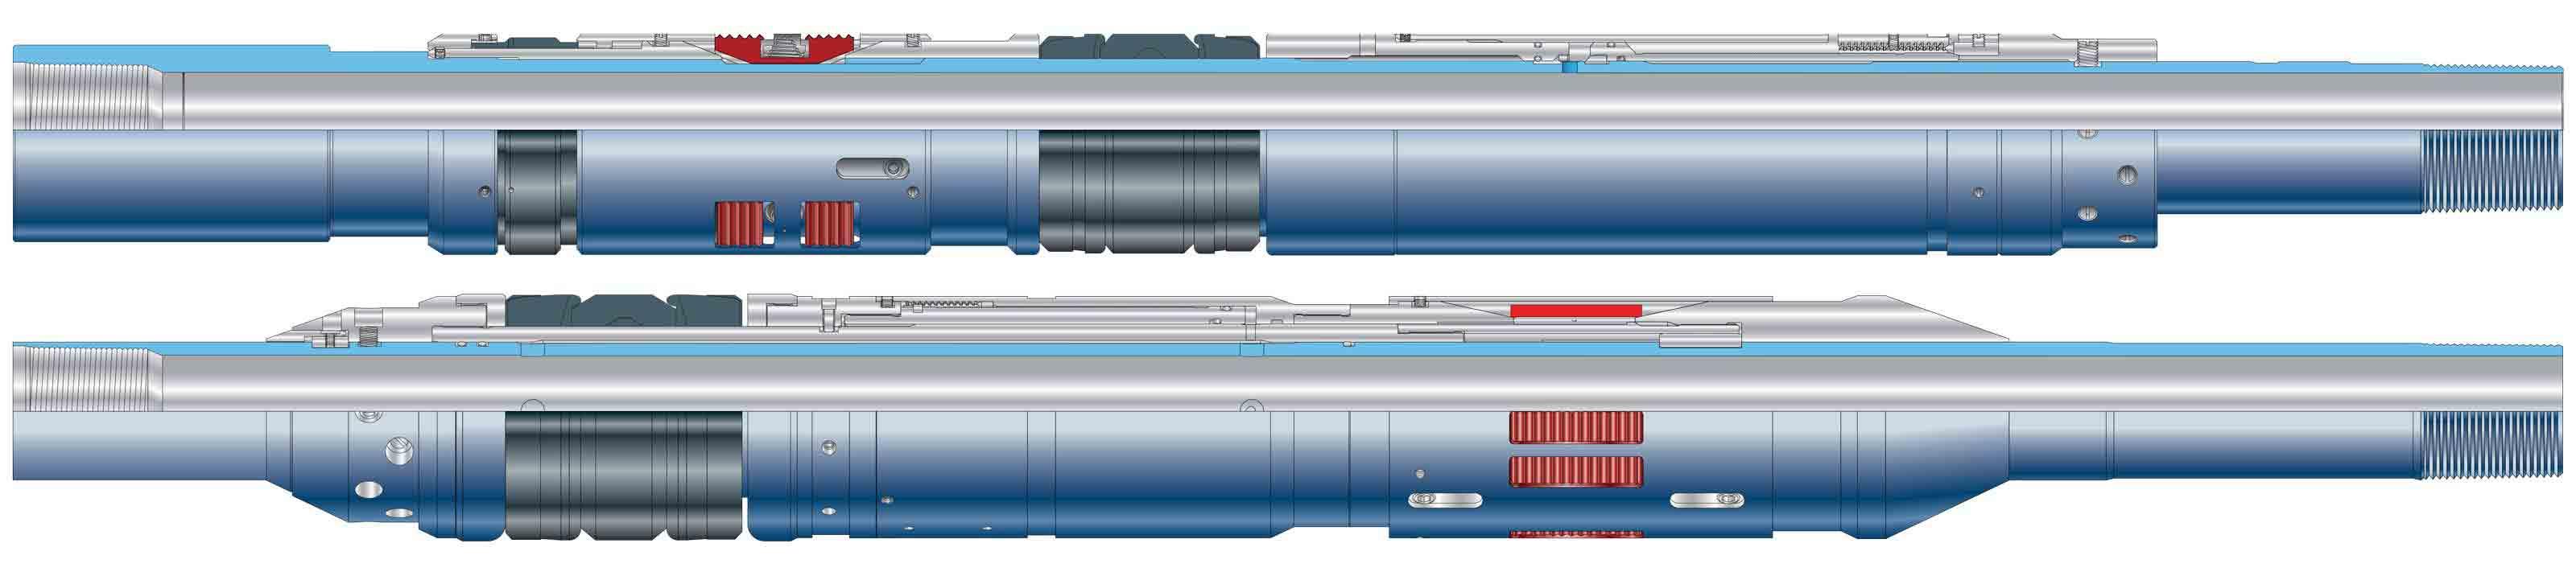 BluePack RH retrievable hydraulic-set production packer